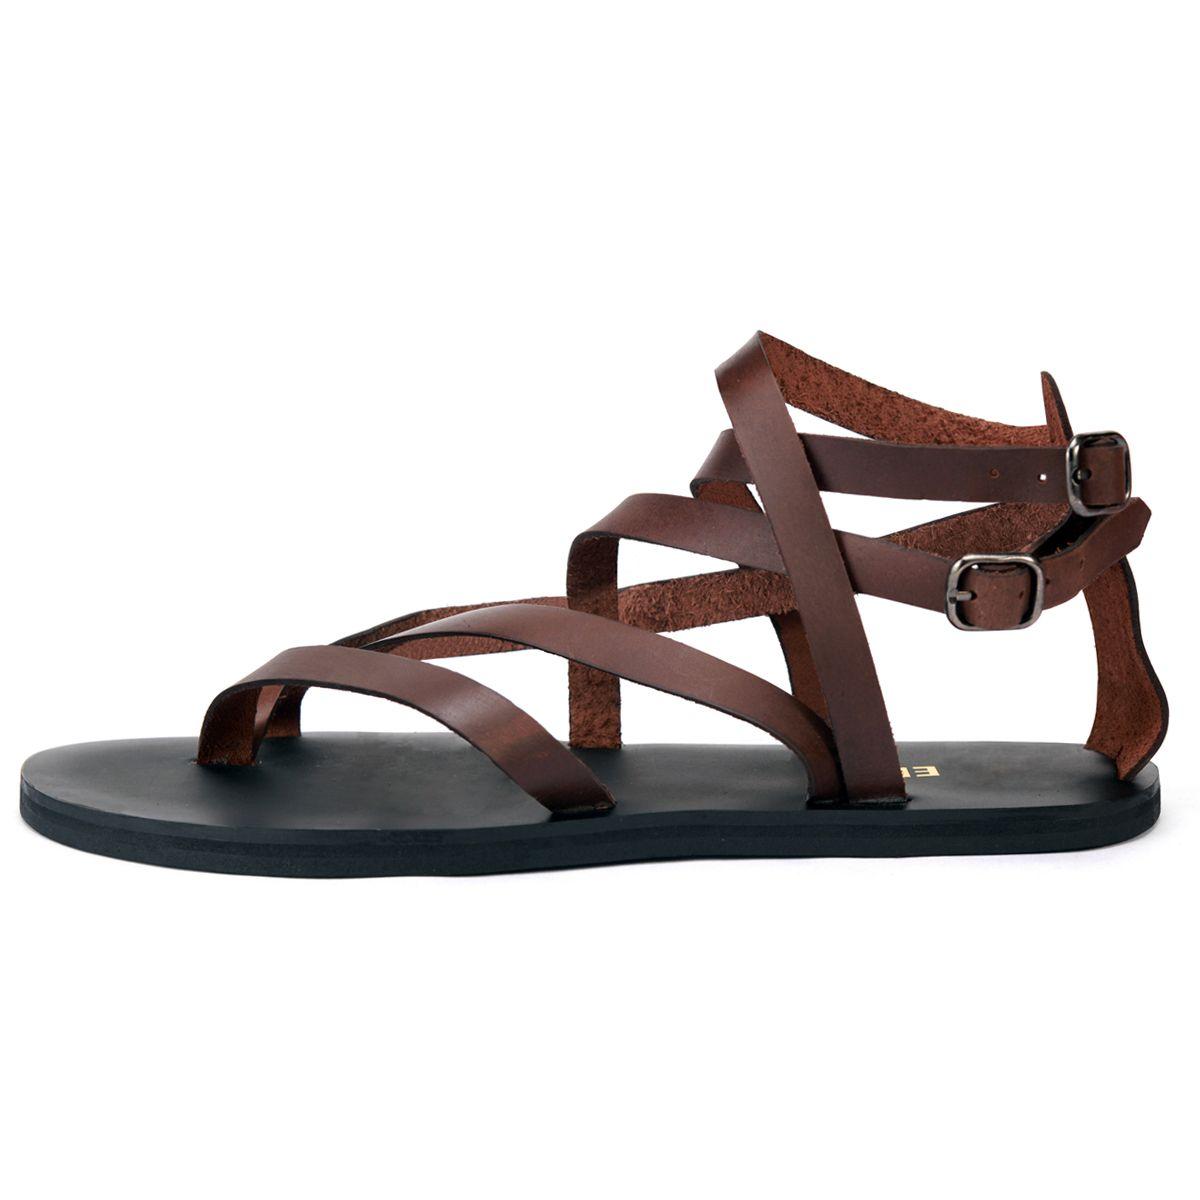 gladiator sandals for men pricegladiator sandals for men